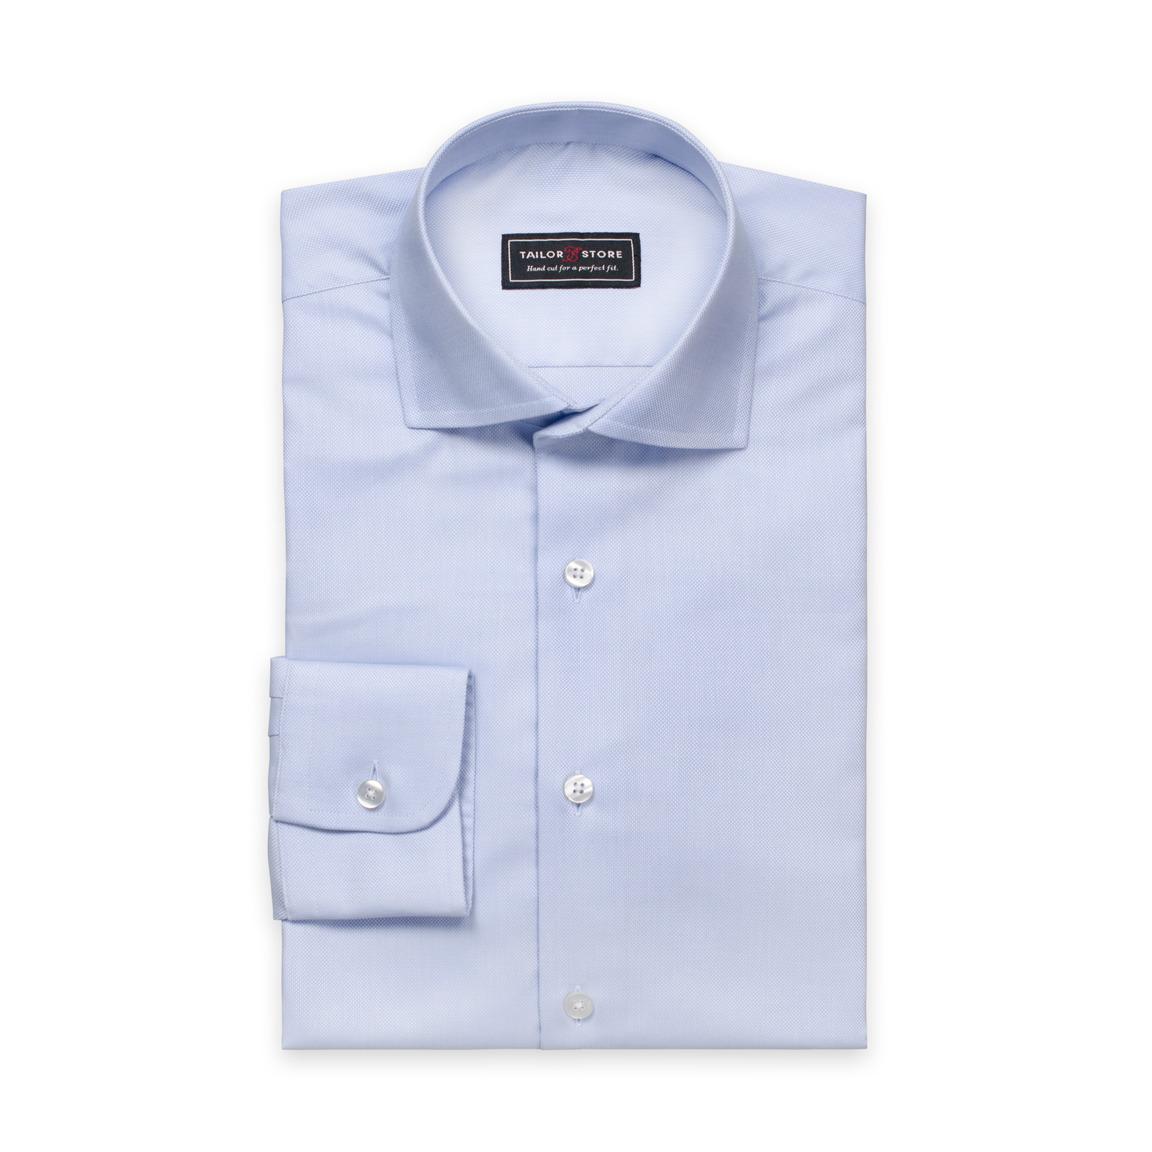 Ljusblå oxfordskjorta